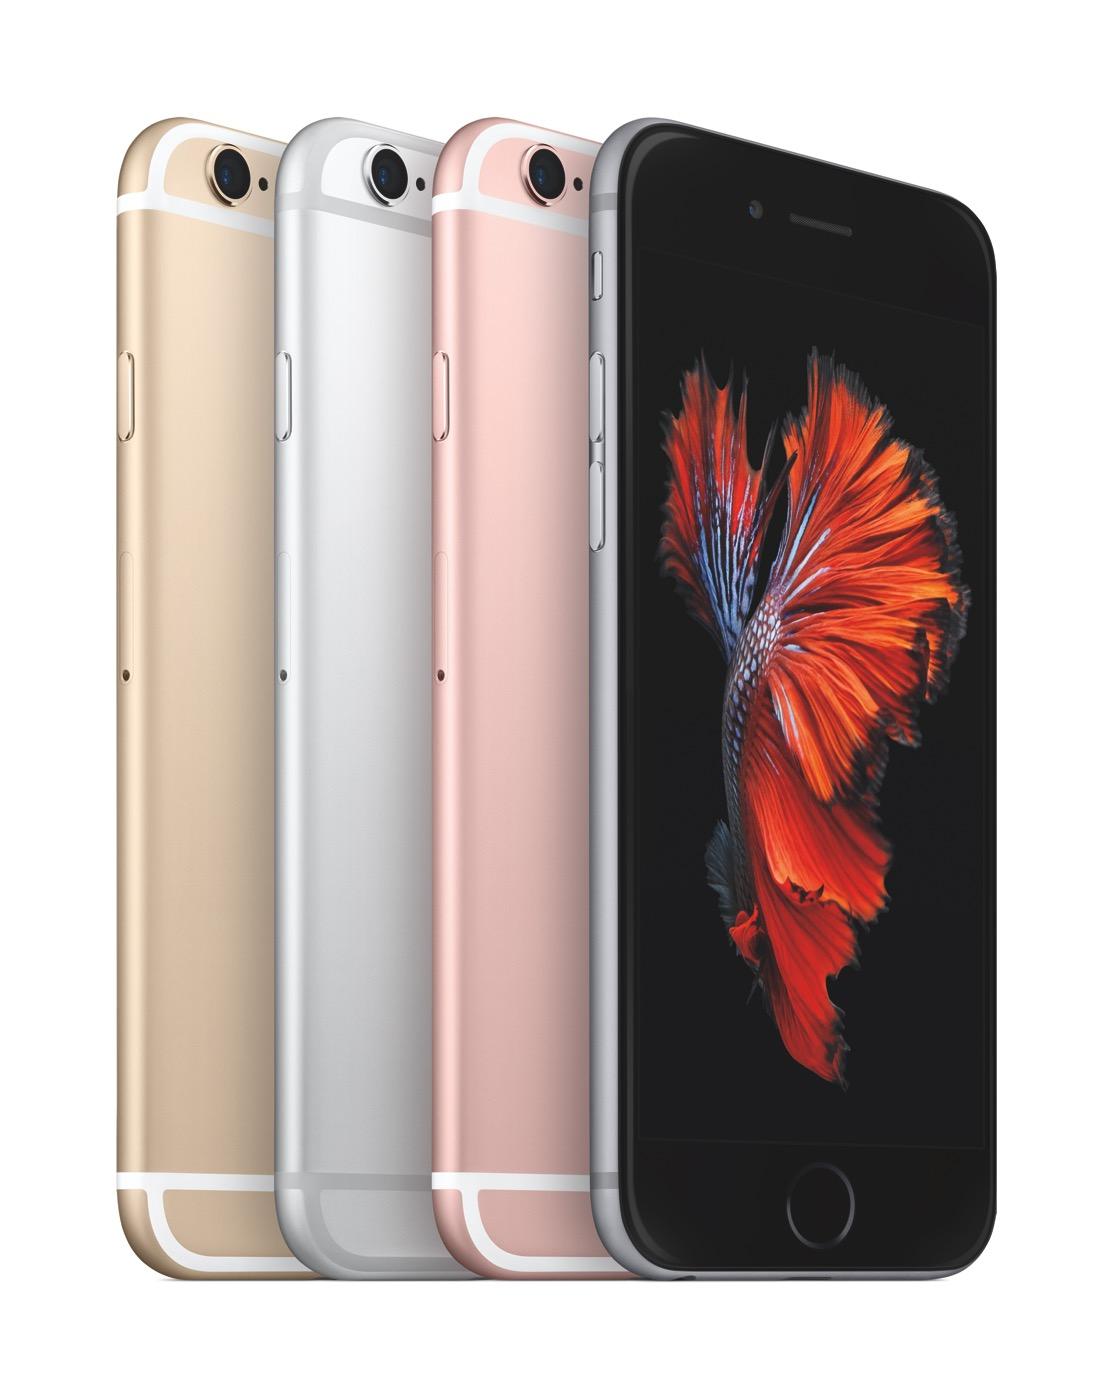 th_iPhone6s-4Color-RedFish-PR-PRINT